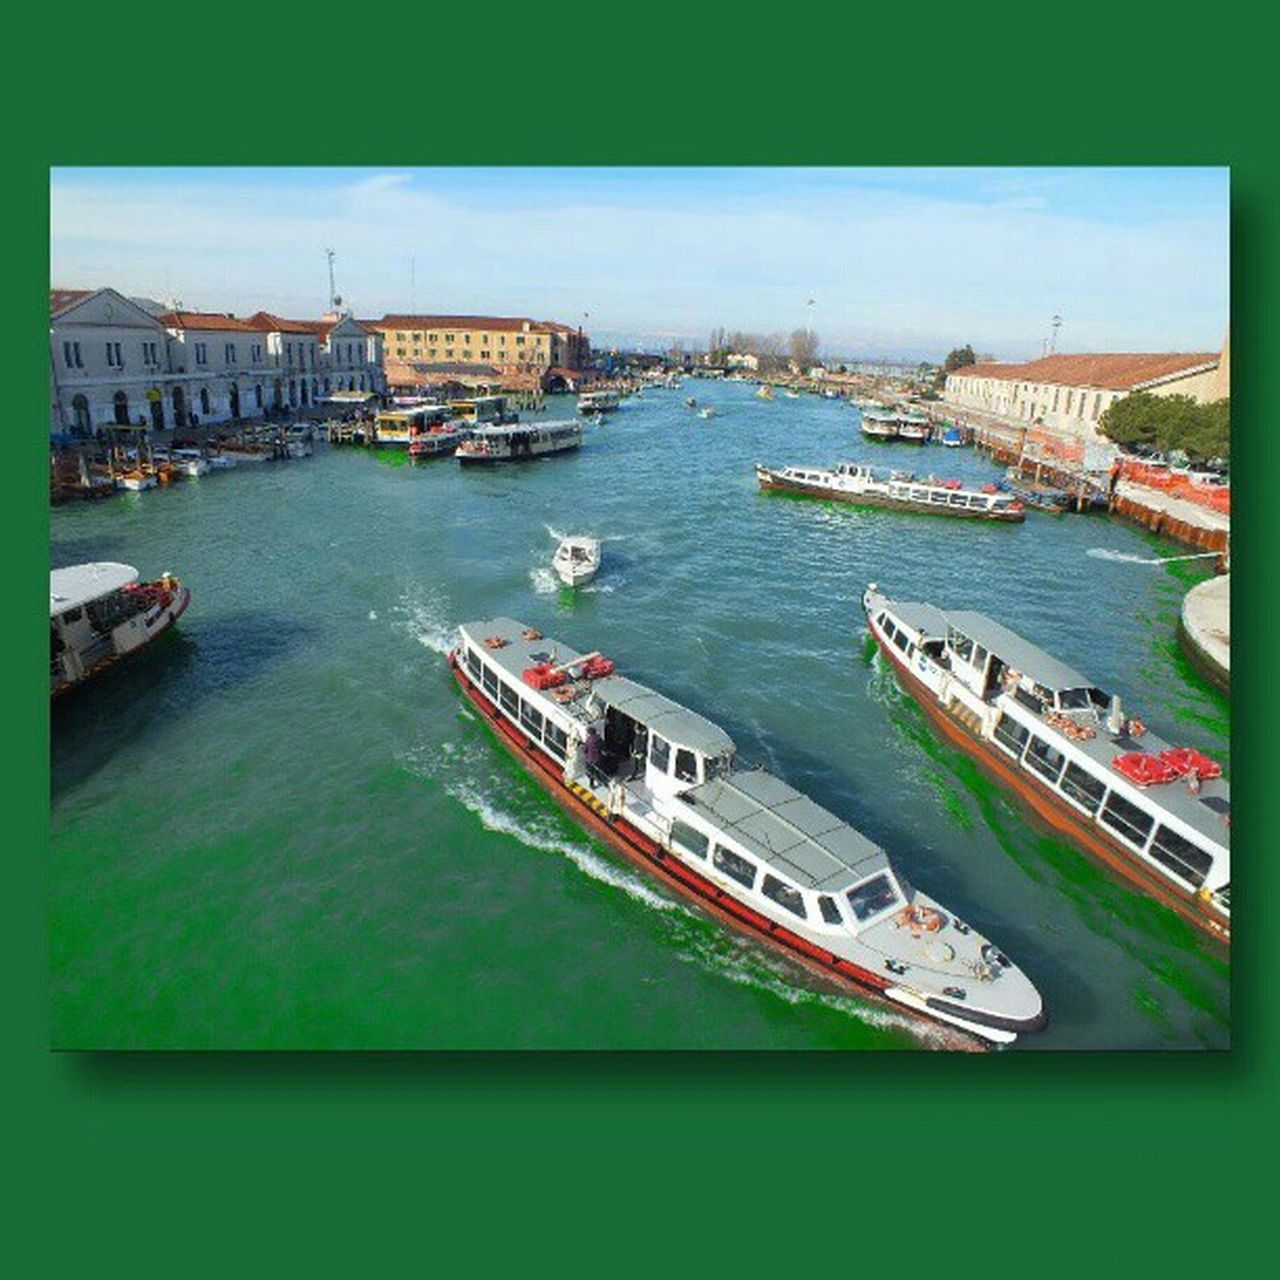 Venice Venezia Venedig Vaporetti boats